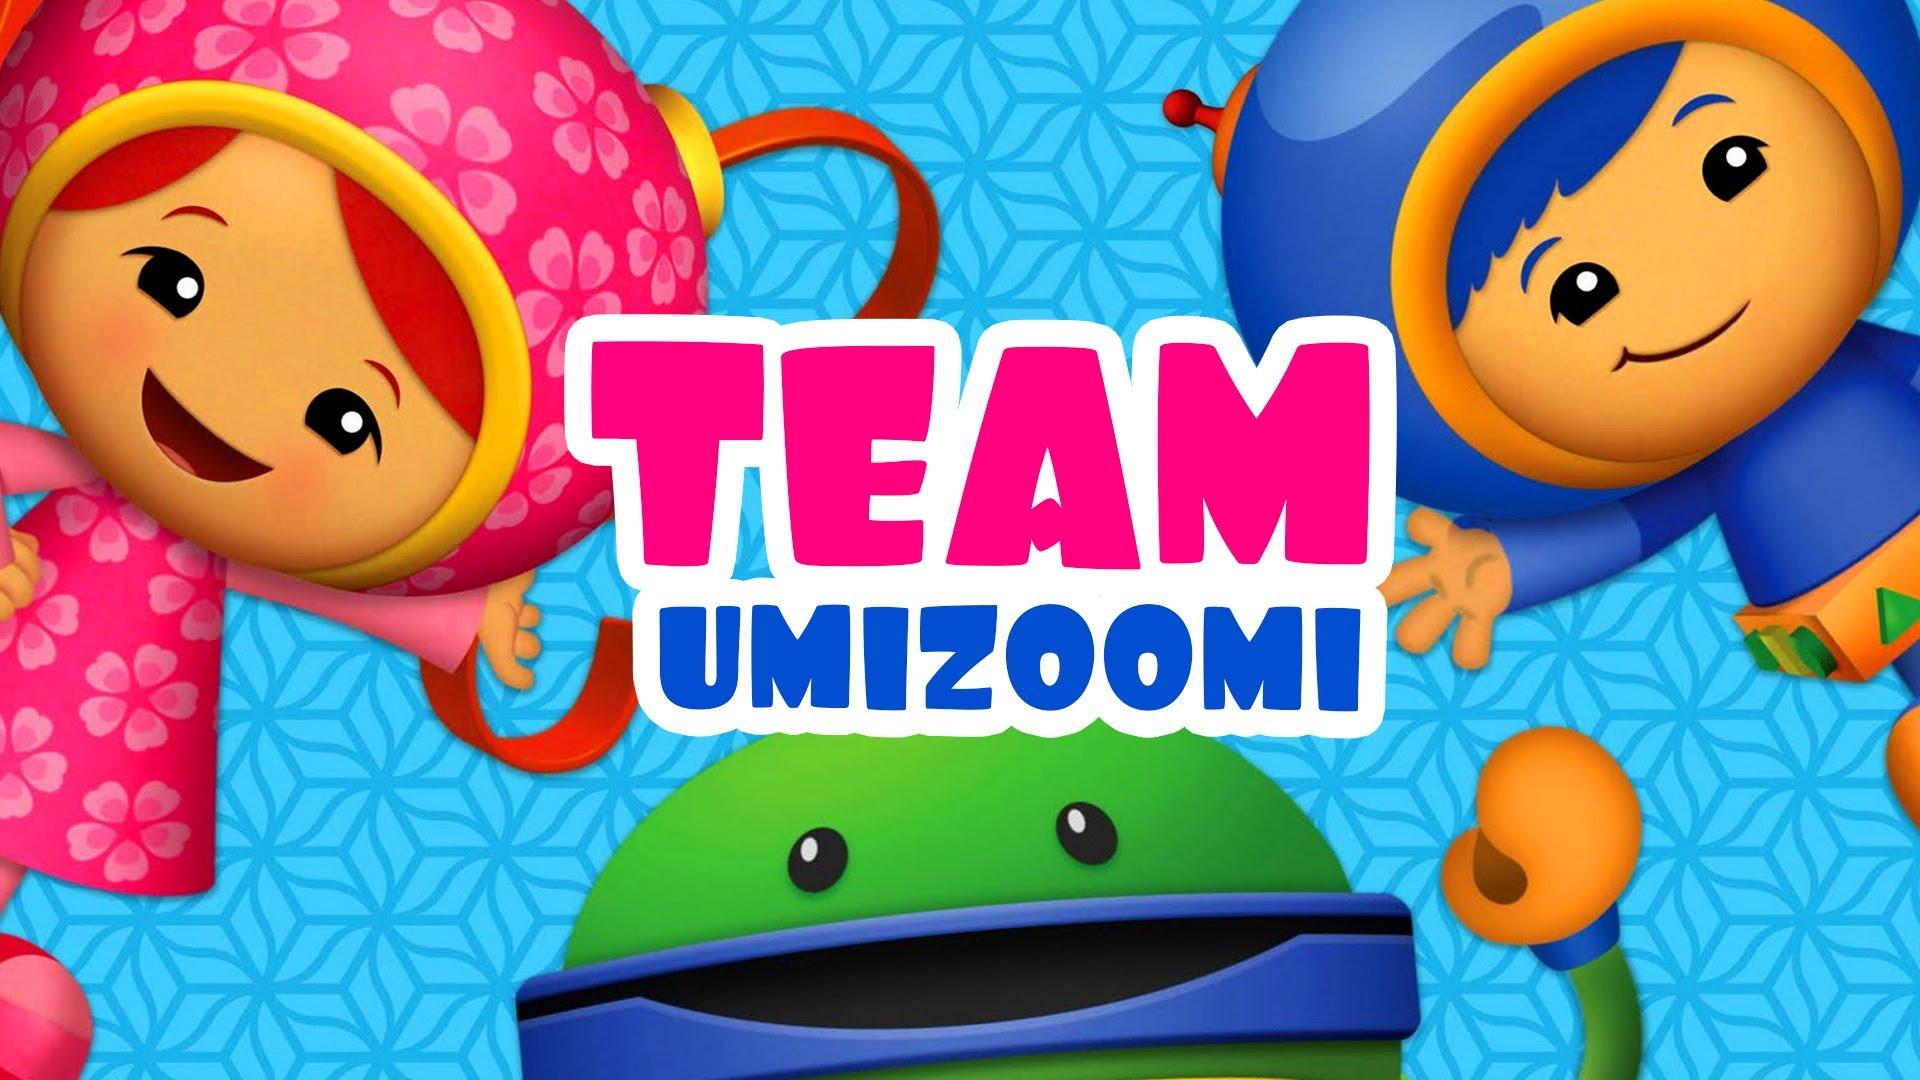 Team Umizoomi HD: Team Umizoomi Full Game Episodes in English